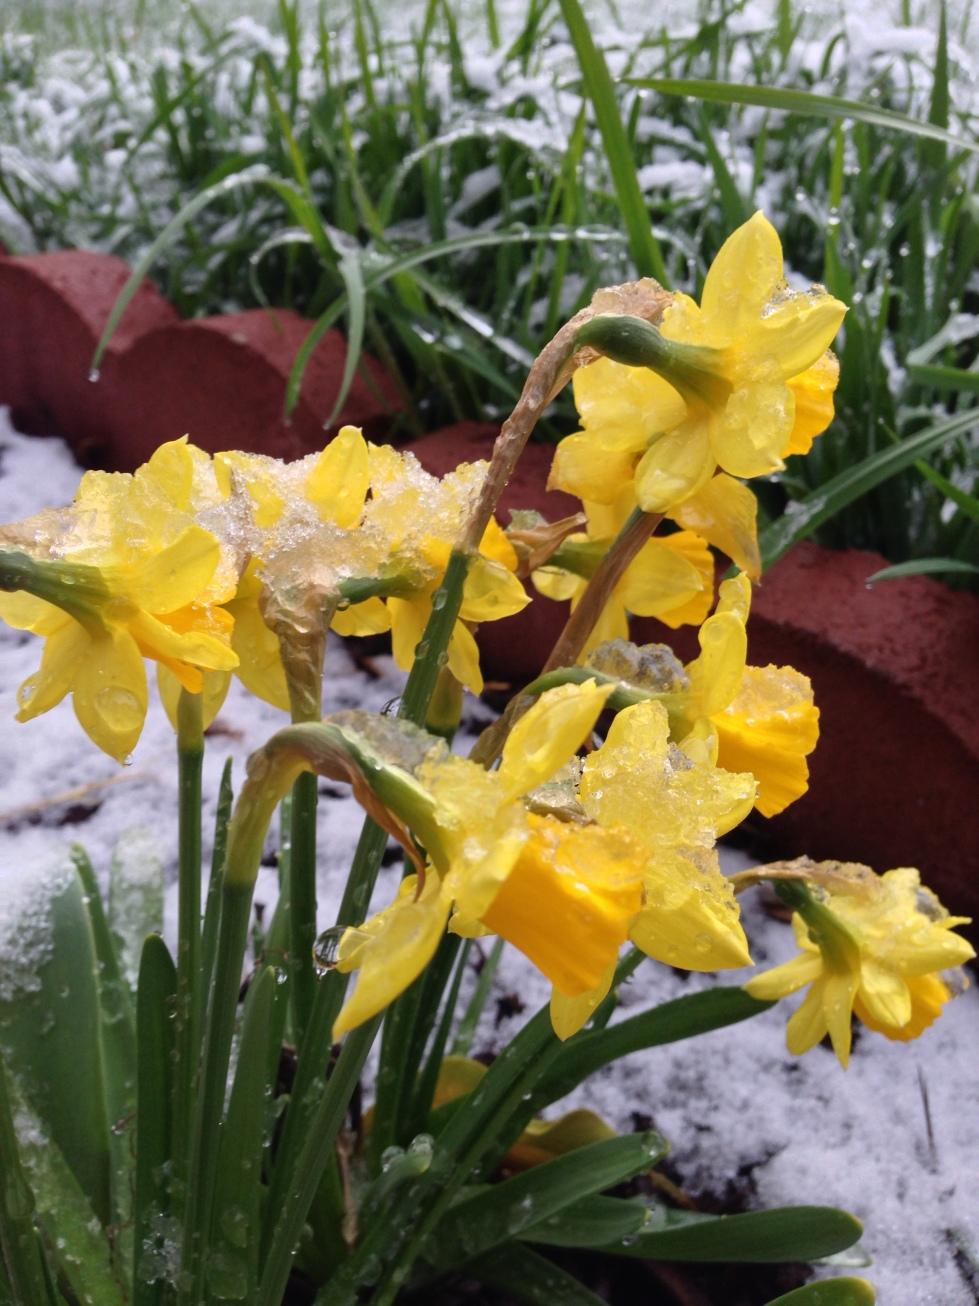 Daffodills pushing through a spring snowstorm